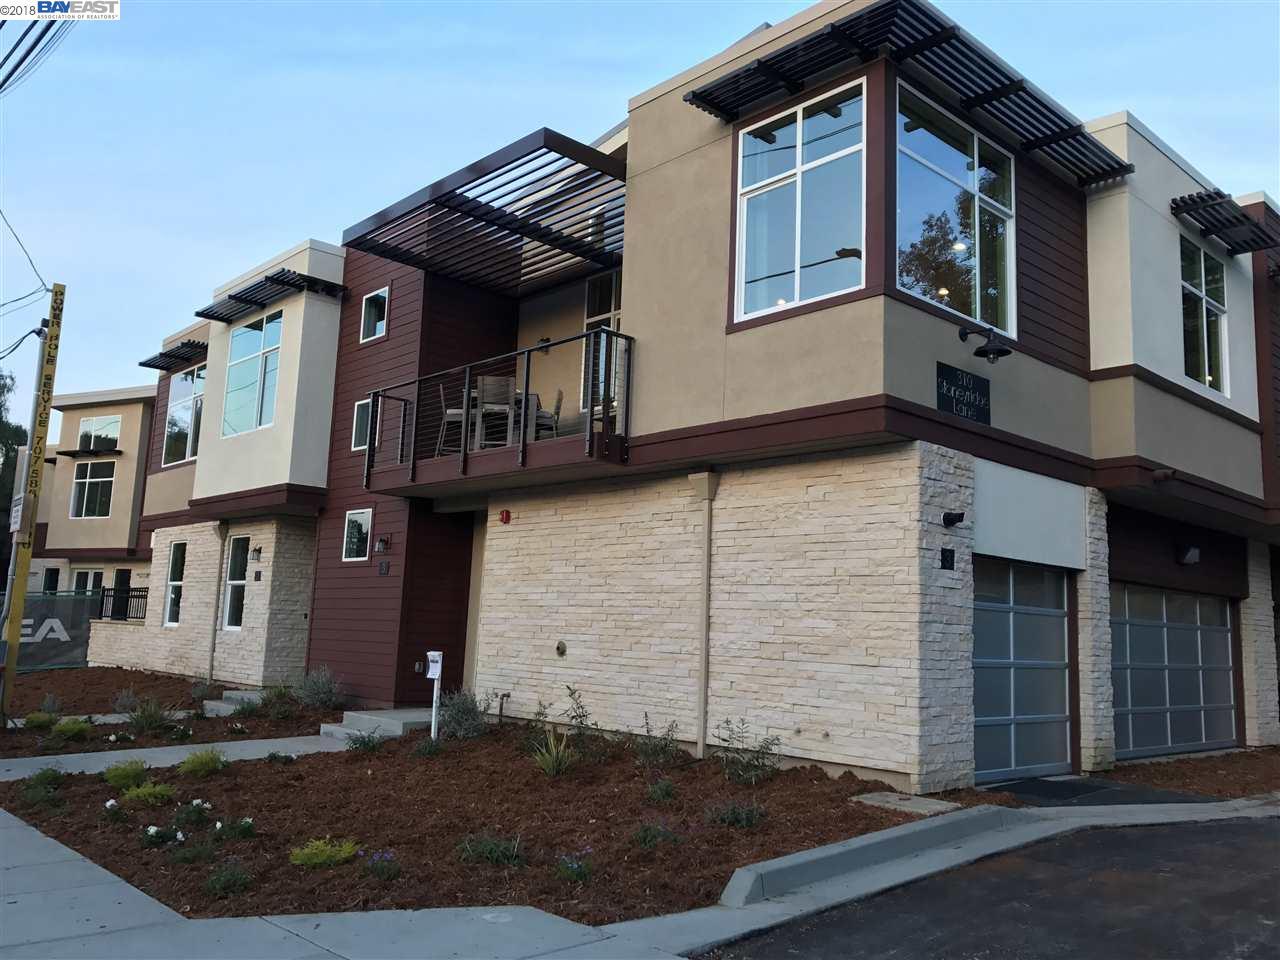 شقة بعمارة للـ Sale في 325 Stoneyridge Lane 325 Stoneyridge Lane Walnut Creek, California 94596 United States